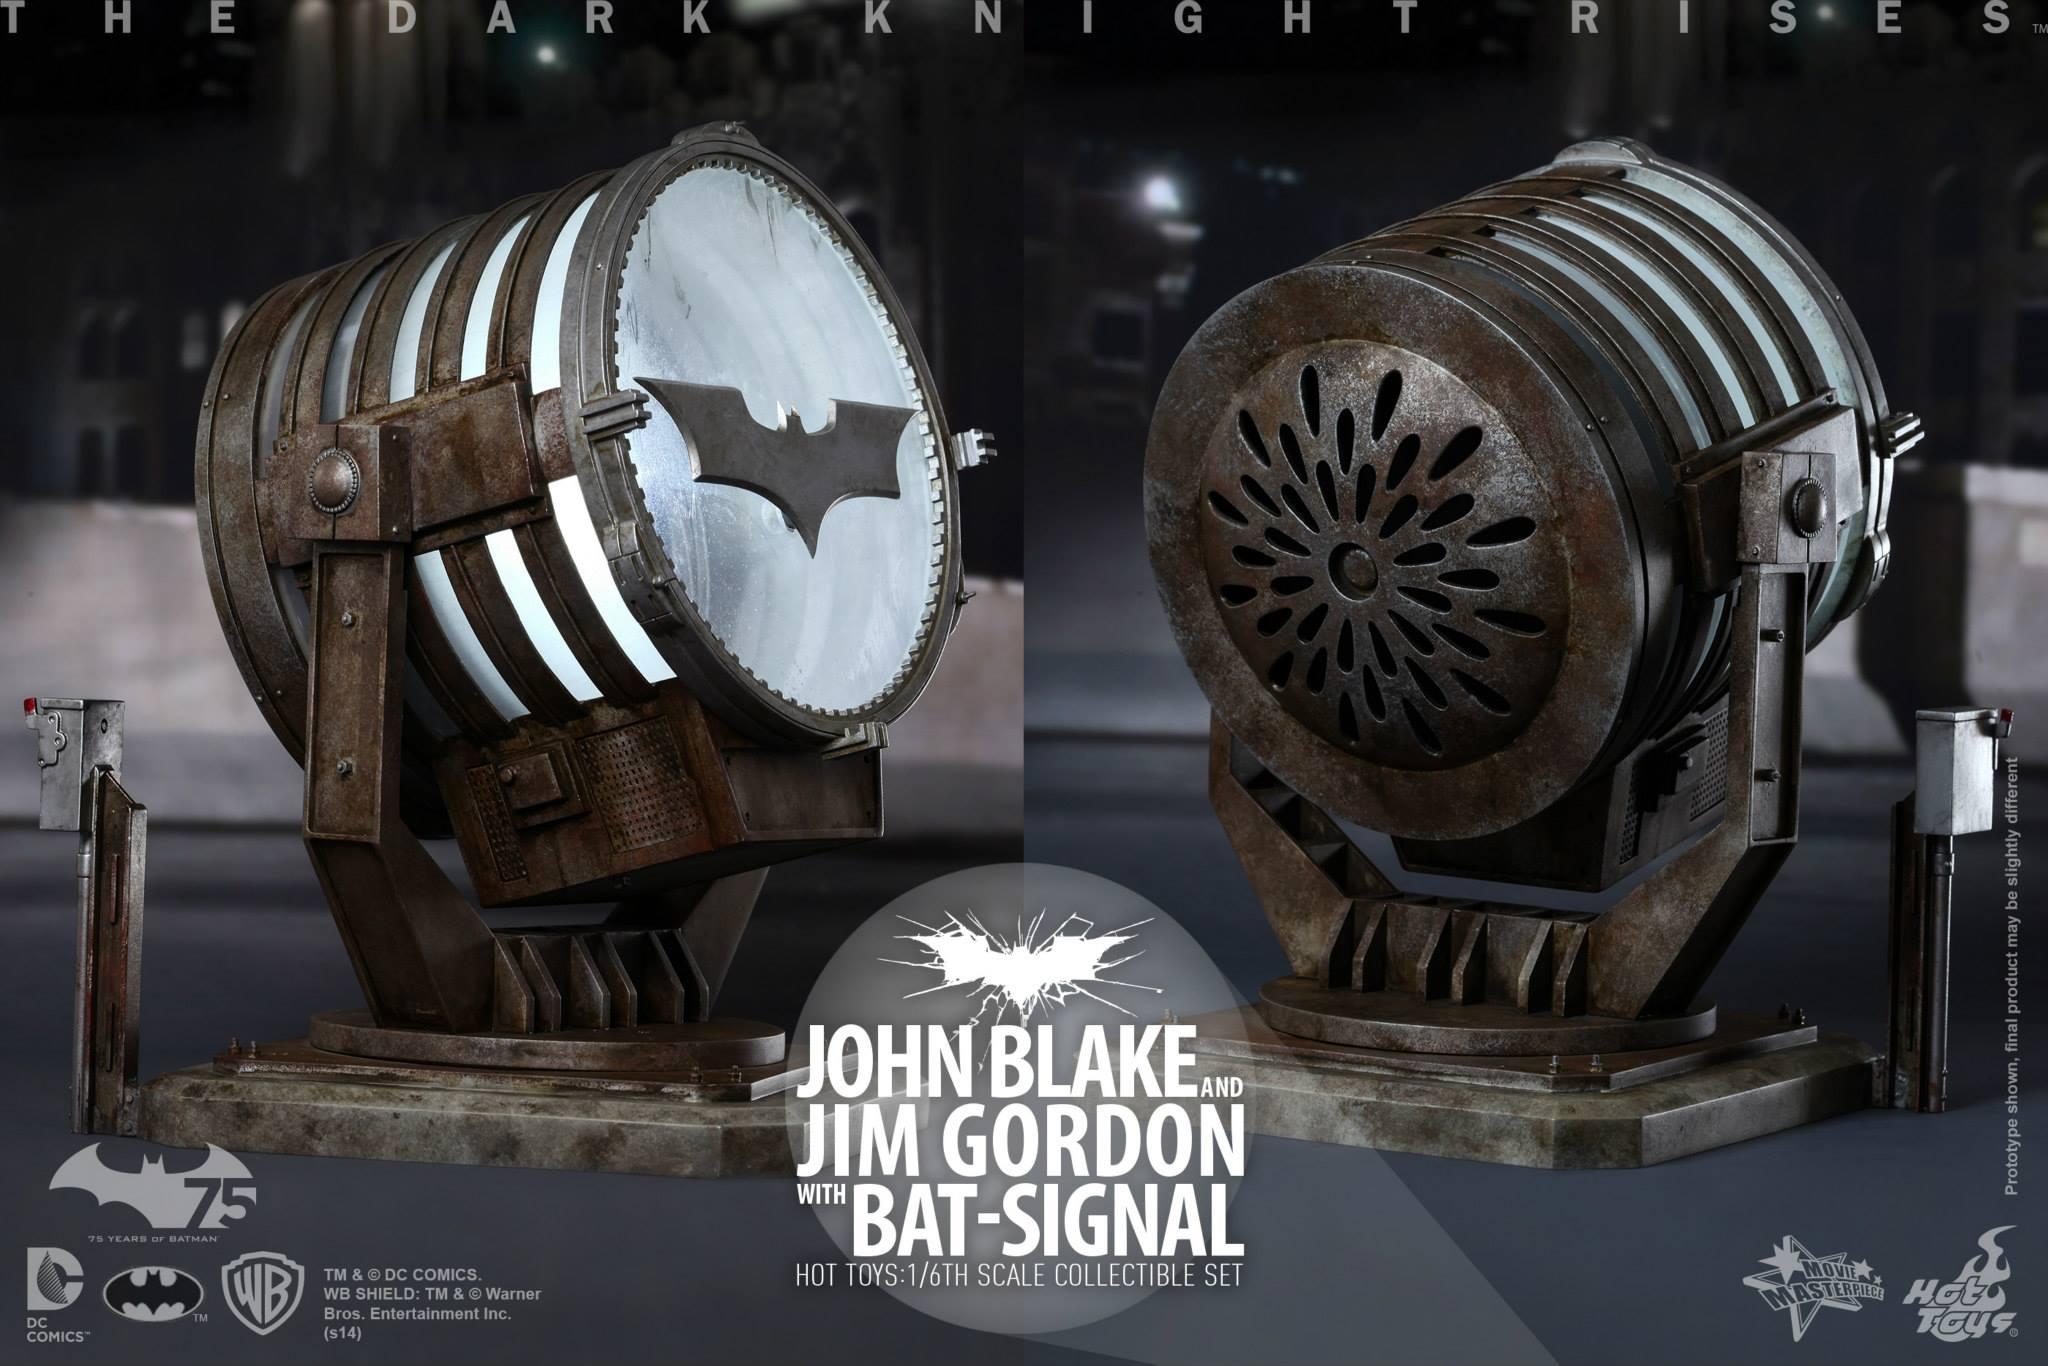 THE DARK KNIGHT RISES - Lt. JIM GORDON & JOHN BLAKE w/BATSIGNAL 221020109